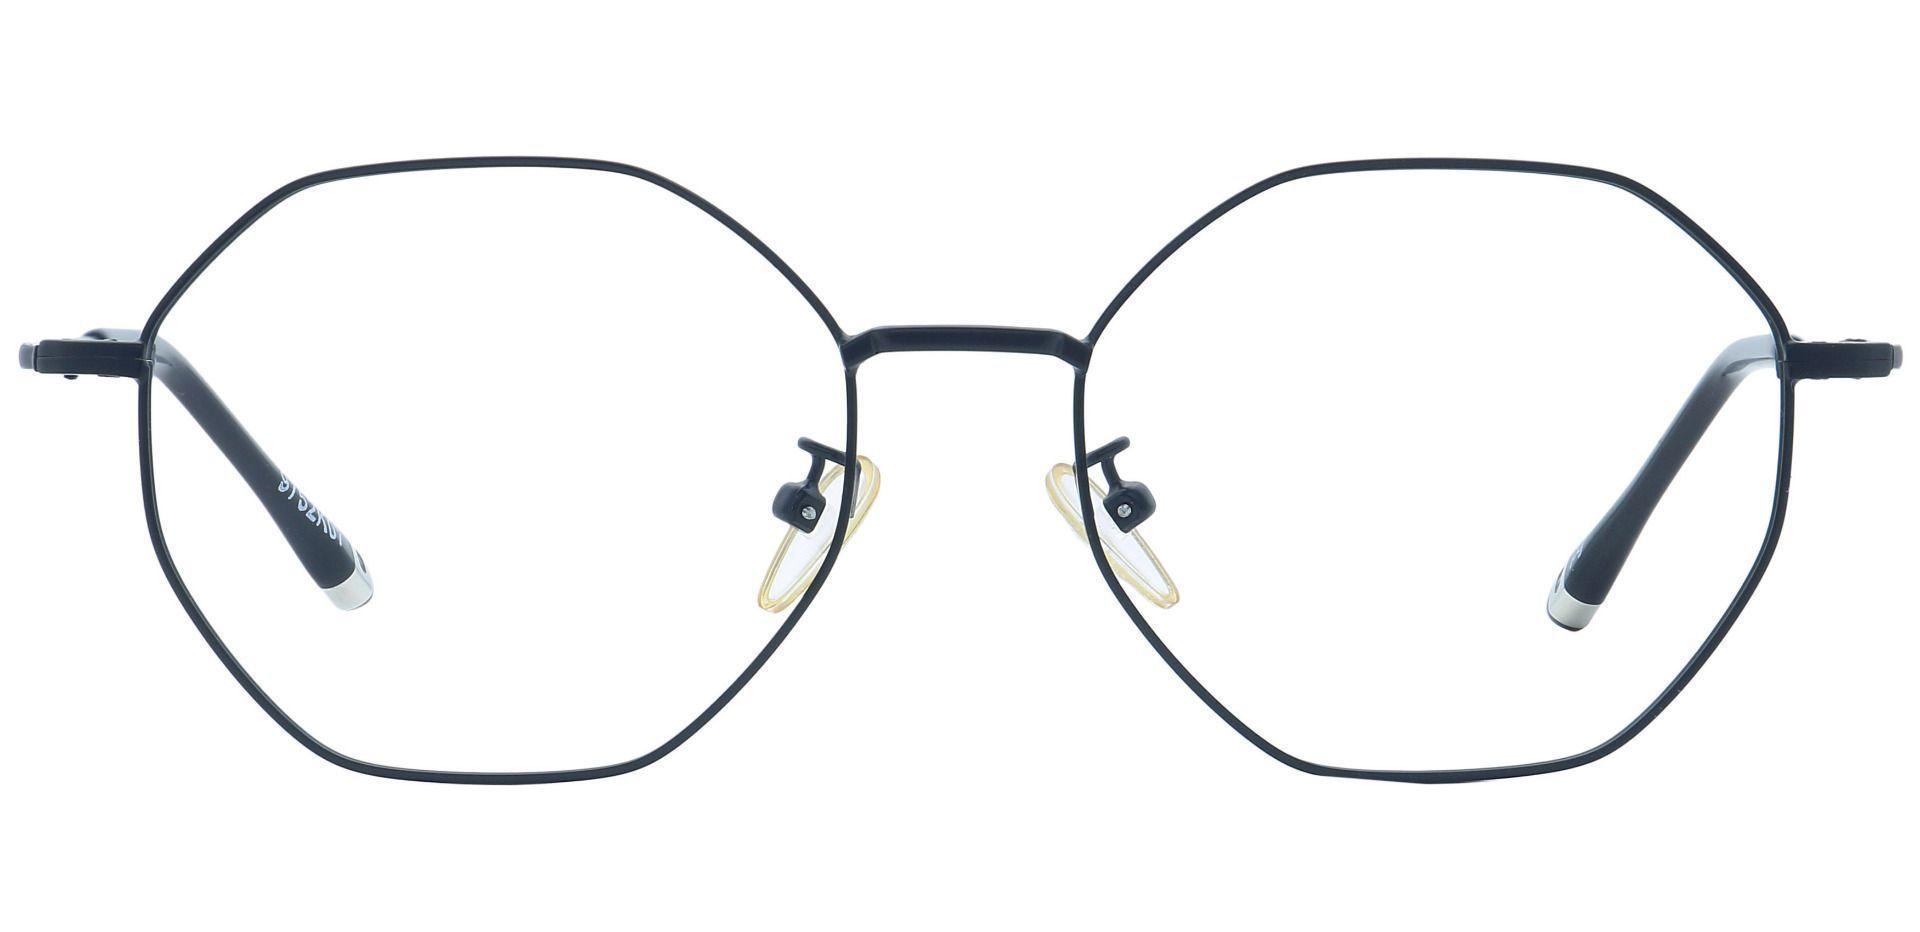 Met Round Progressive Glasses - Black